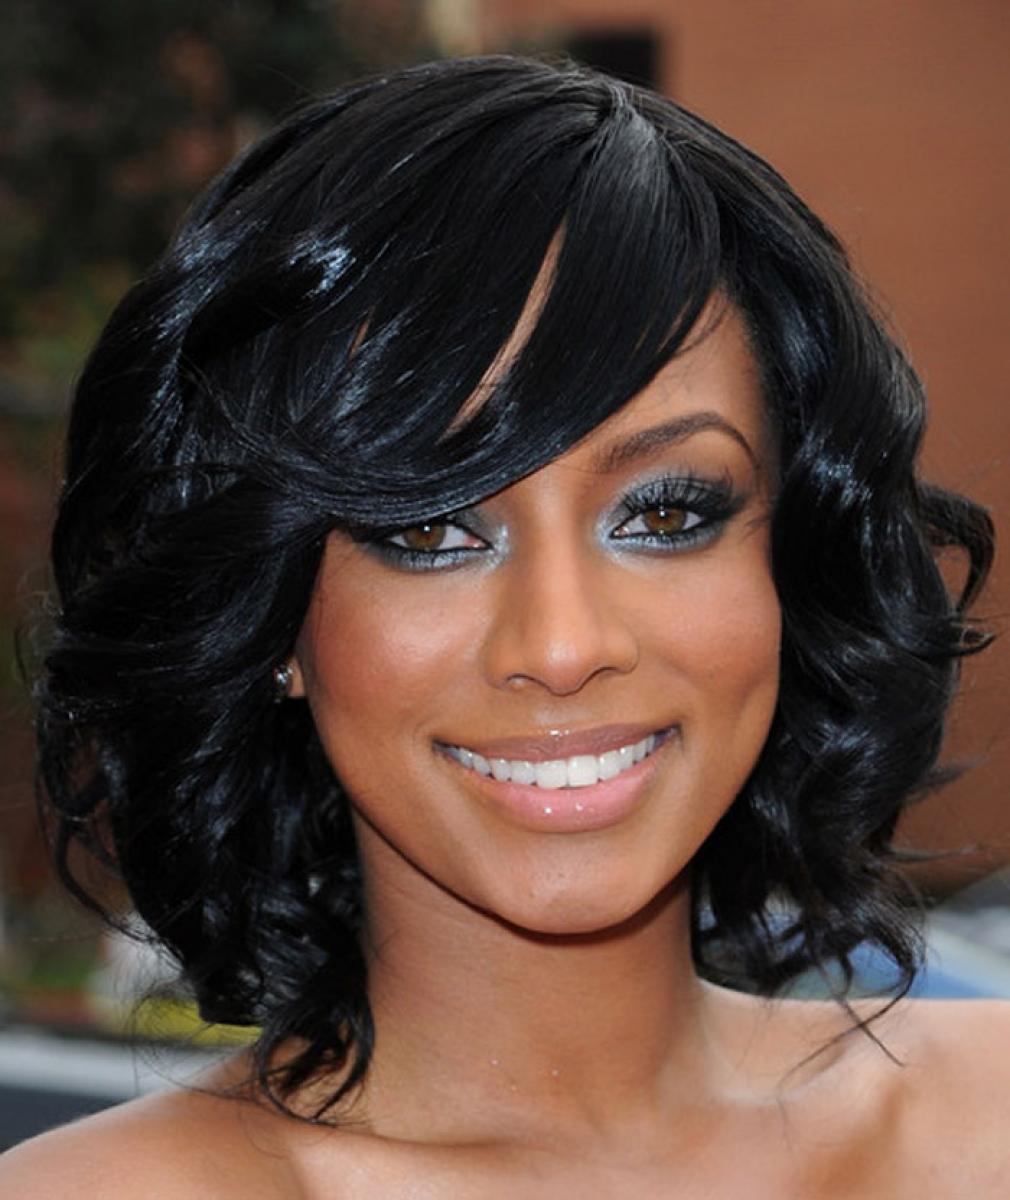 Black hairstyles pics #13